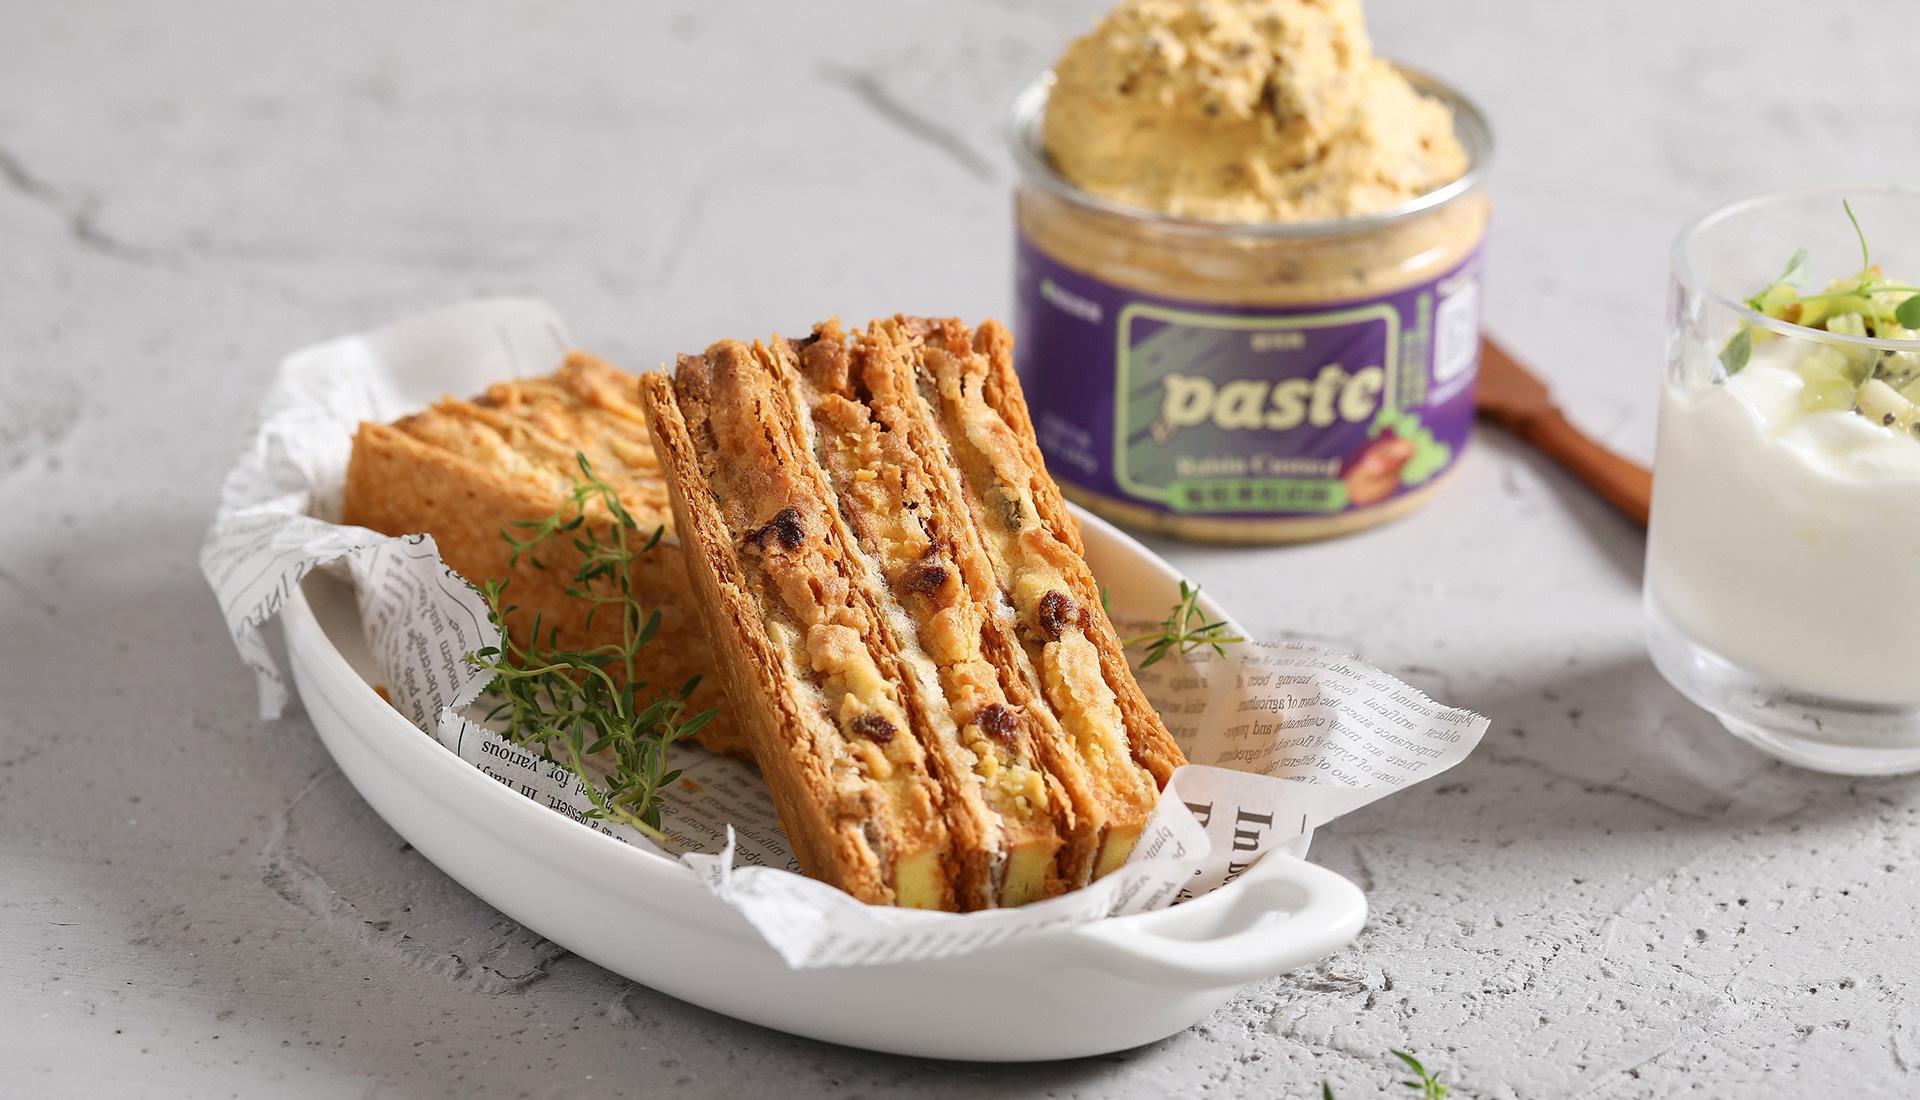 paste-葡萄果粒奶酥